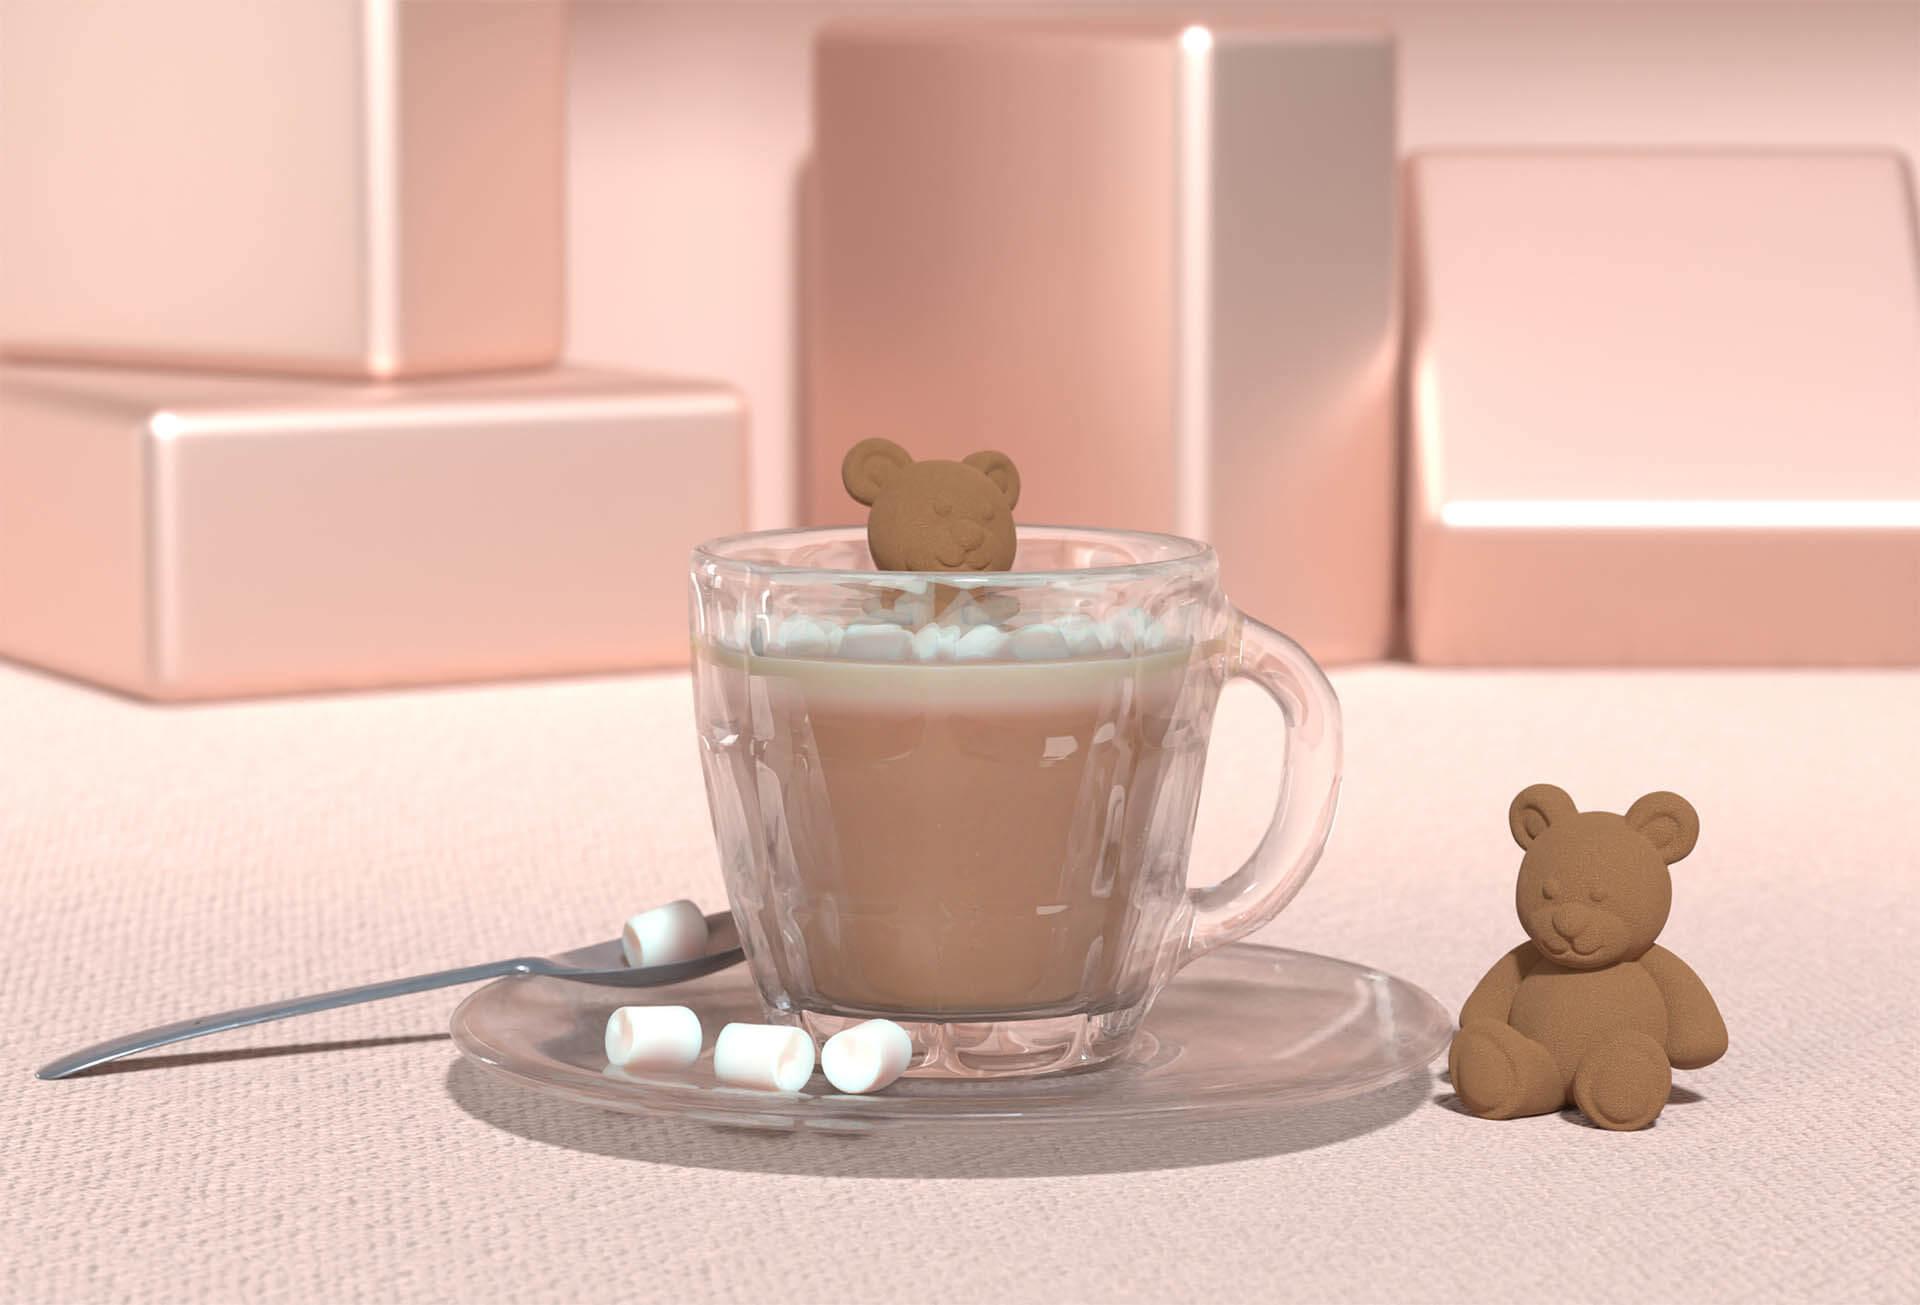 poseidn-3ddrink-3dfood-glassshot-laura